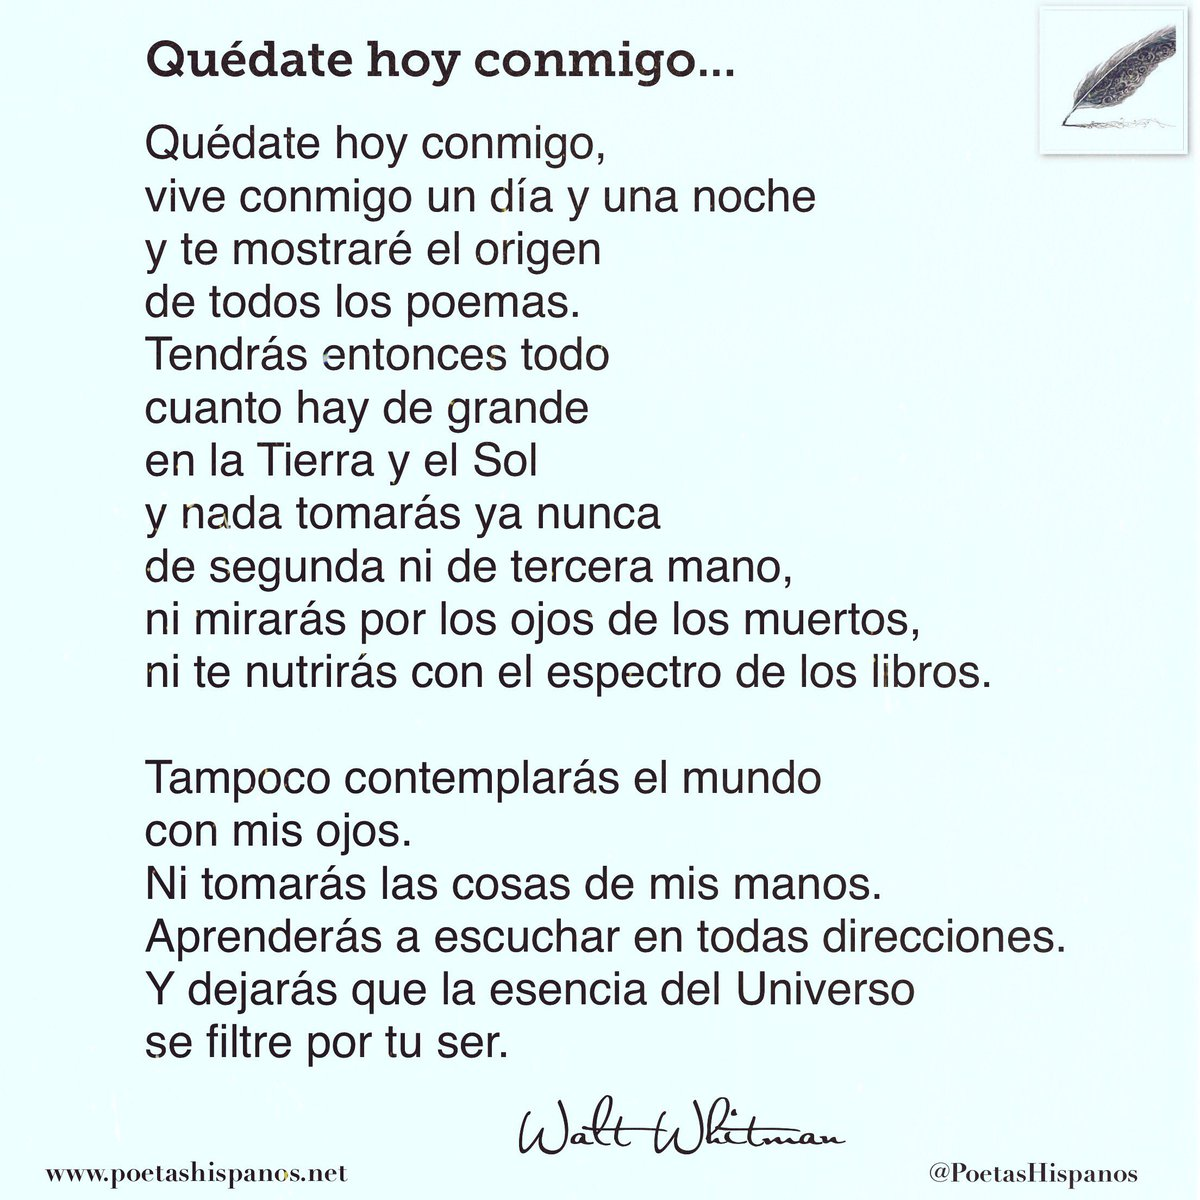 "Poetas Hispanos® on Twitter: """"Quédate hoy conmigo"" por Walt ..."